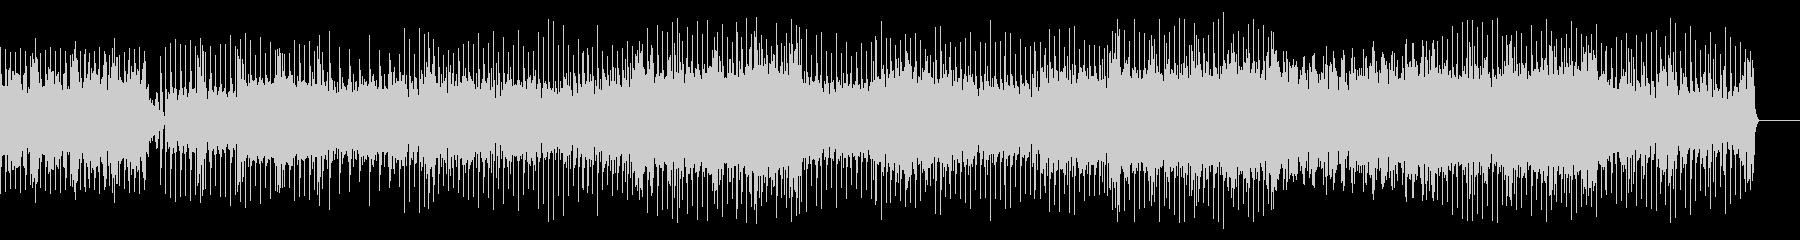 EDM/ポップメロ/ゲームサウンドの未再生の波形